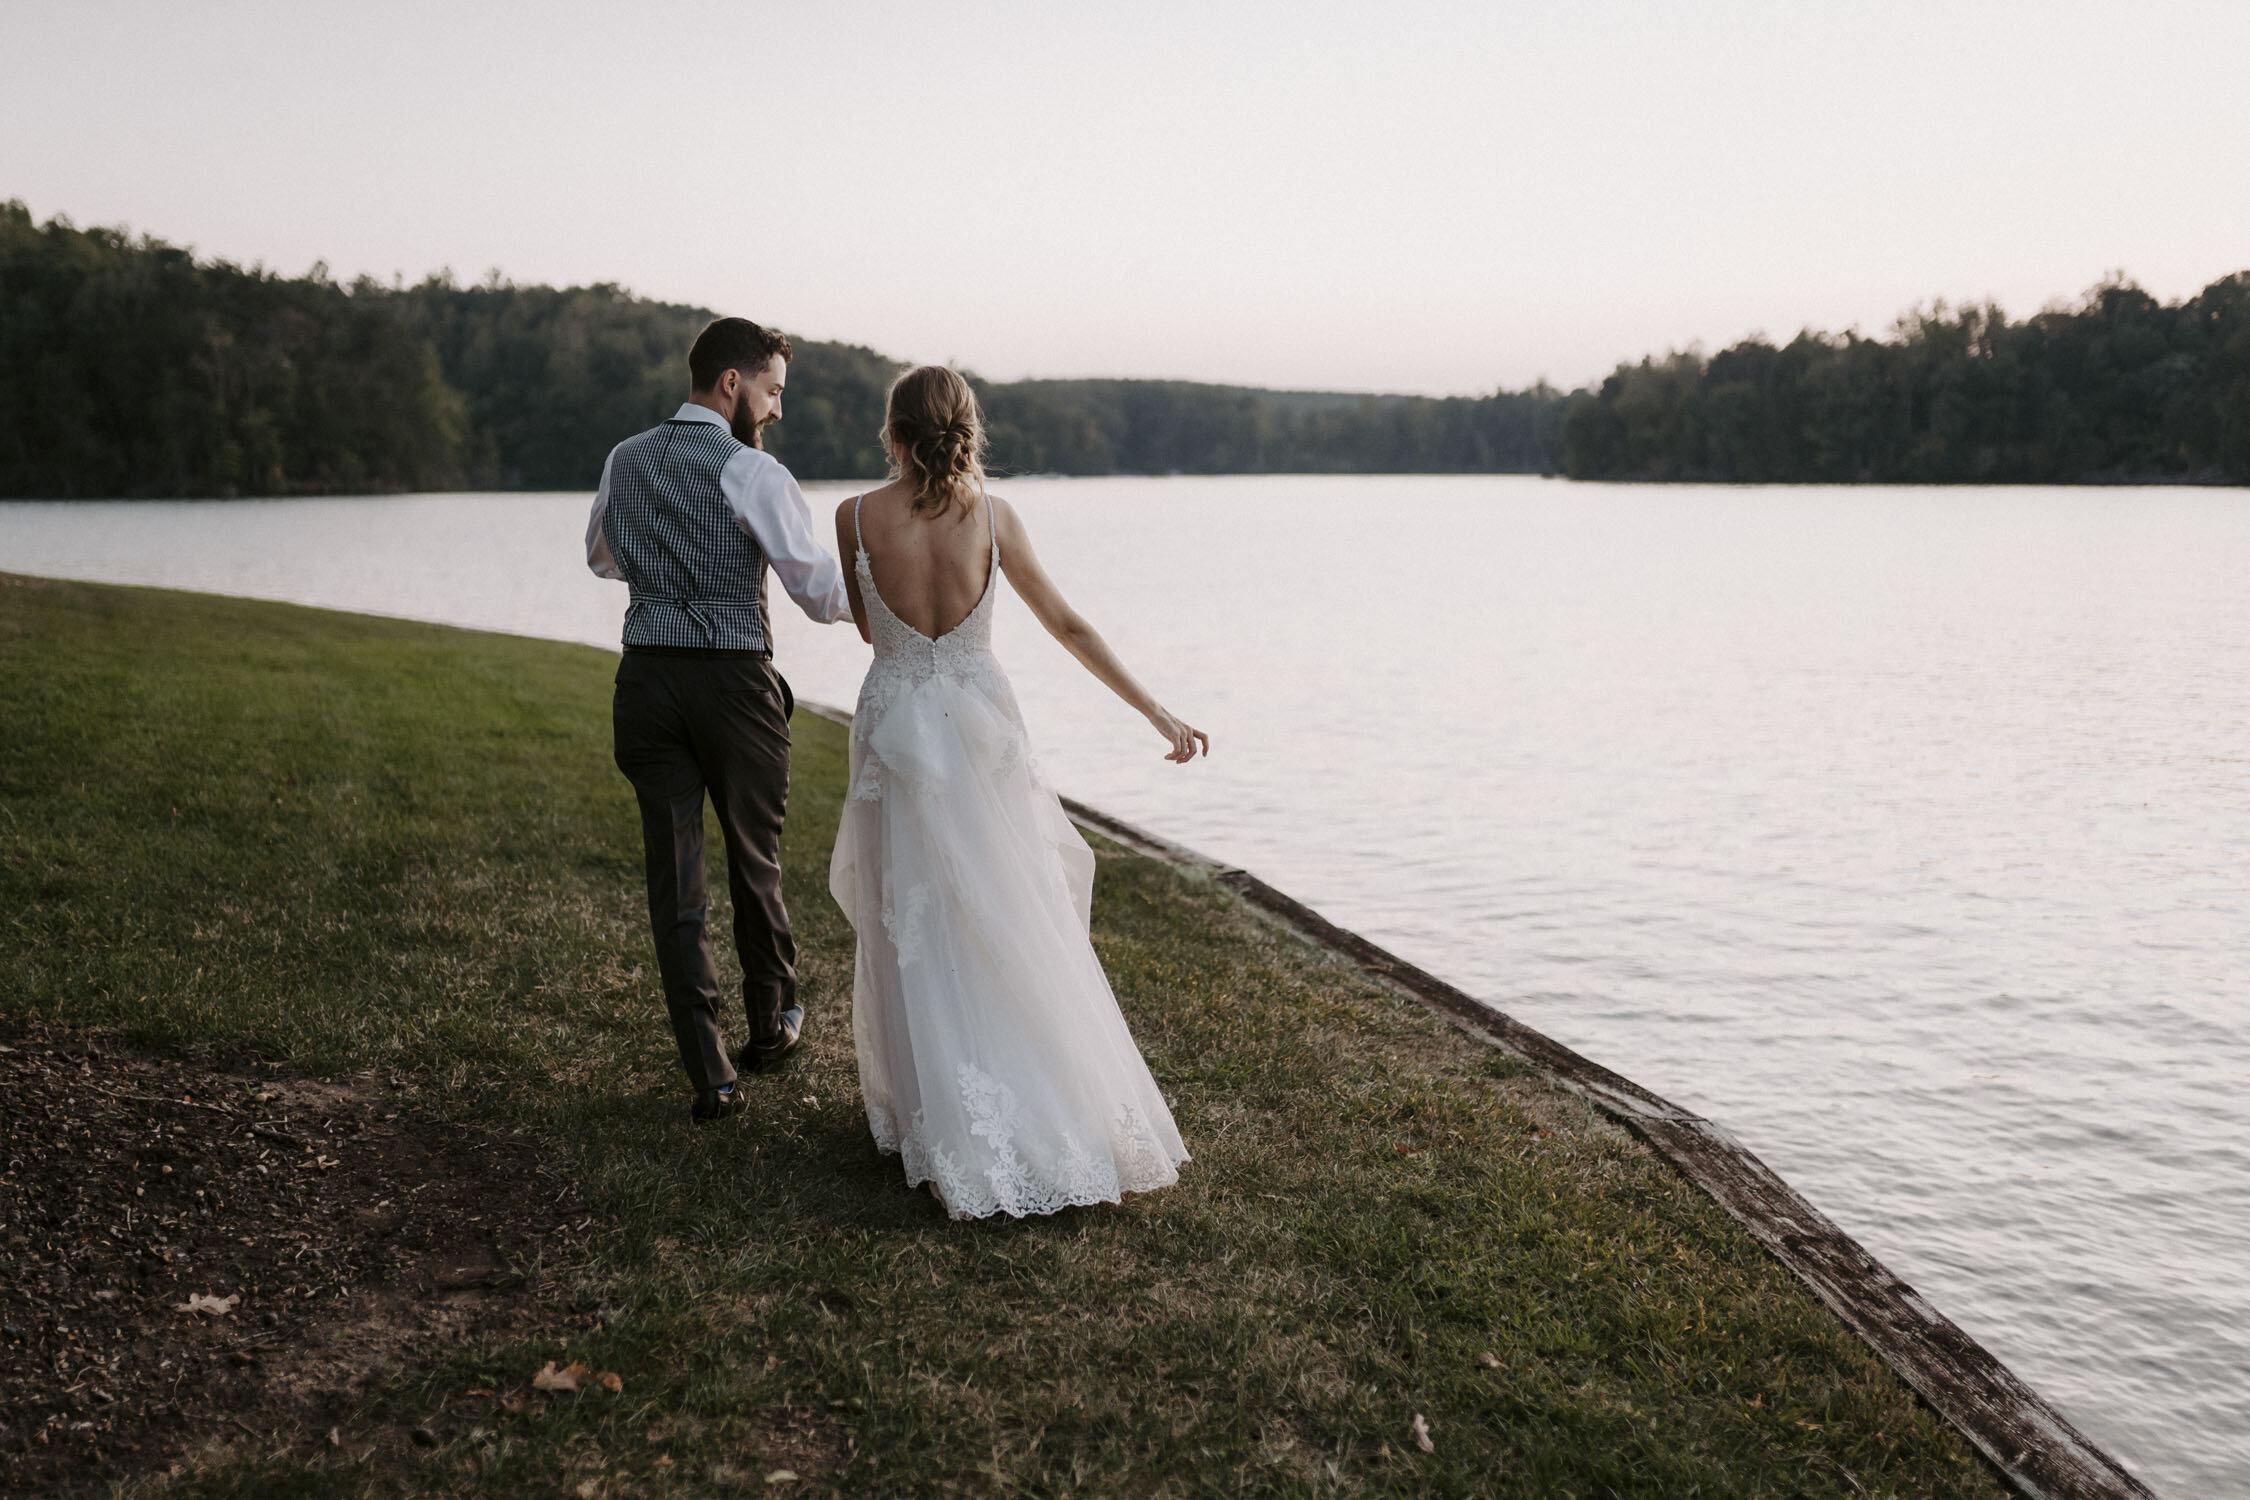 Romantic Bride and Groom Portraits at Bella Collina   By Greensboro, NC Wedding Photographer: Kayli LaFon Photography